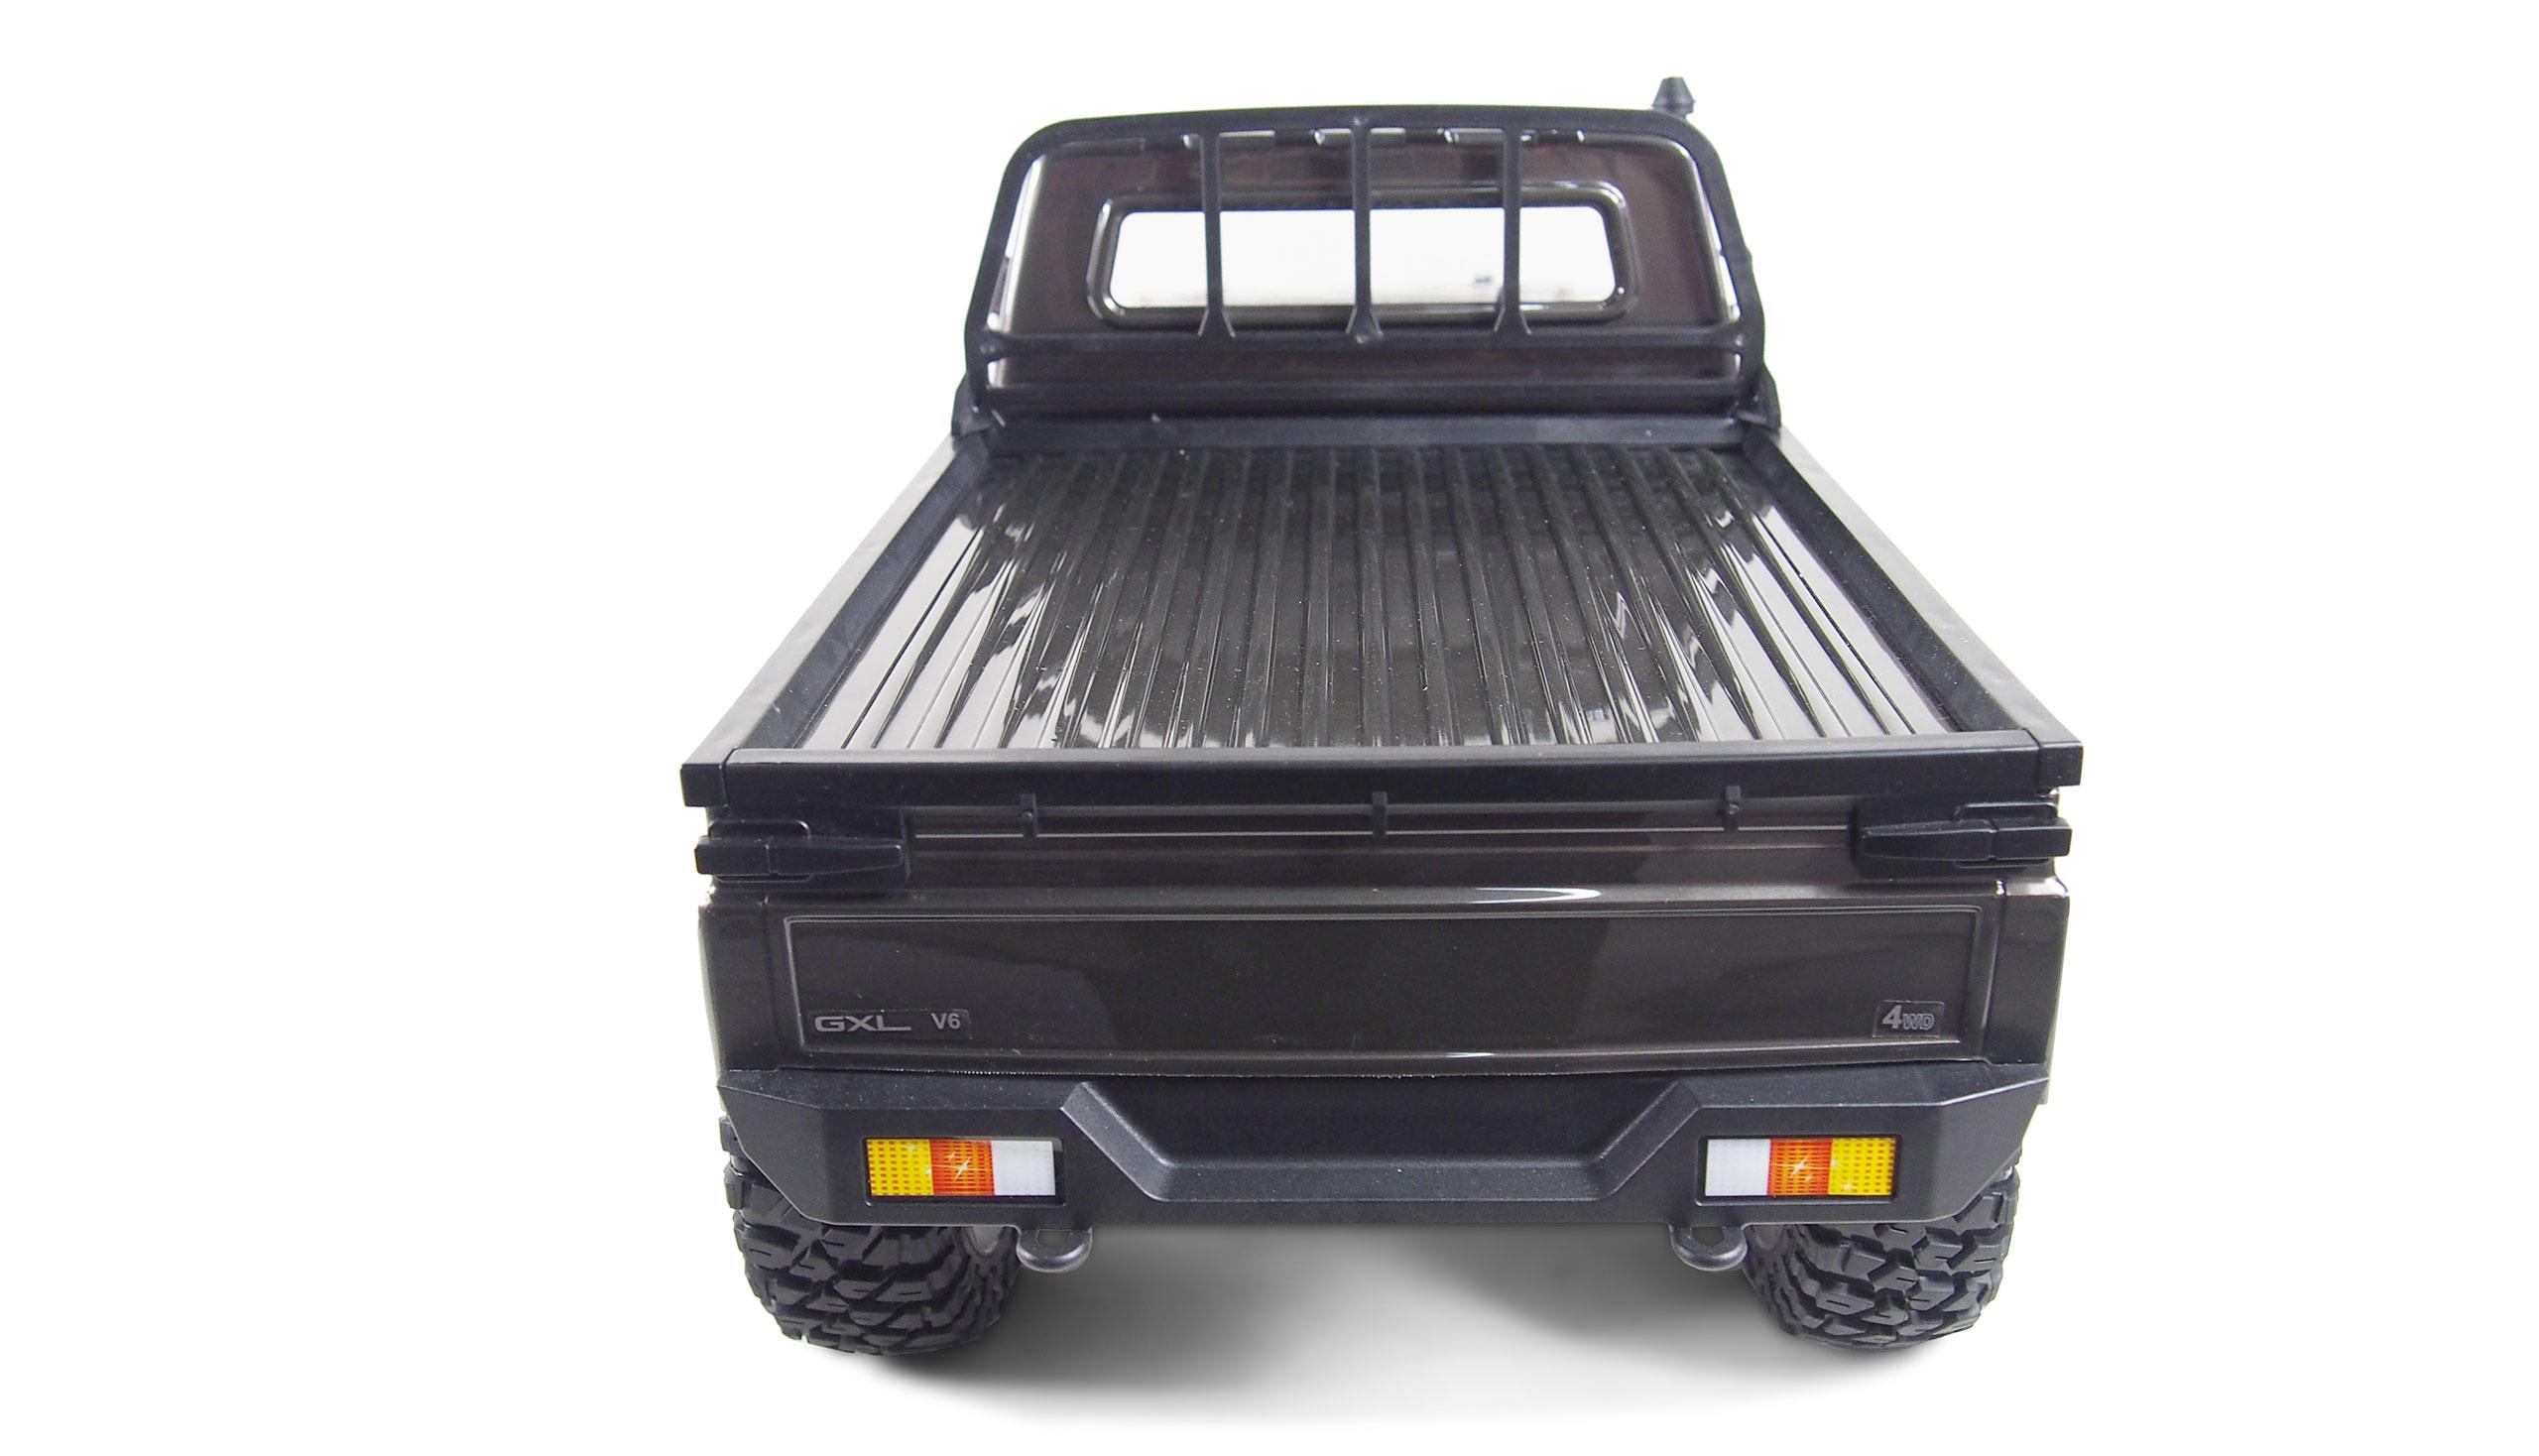 Amewi AMXRock RCX10P Scale Crawler - Raupenfahrzeug - Elektromotor - 1:10 - Betriebsbereit (RTR) - Grau - Aluminium - Metall